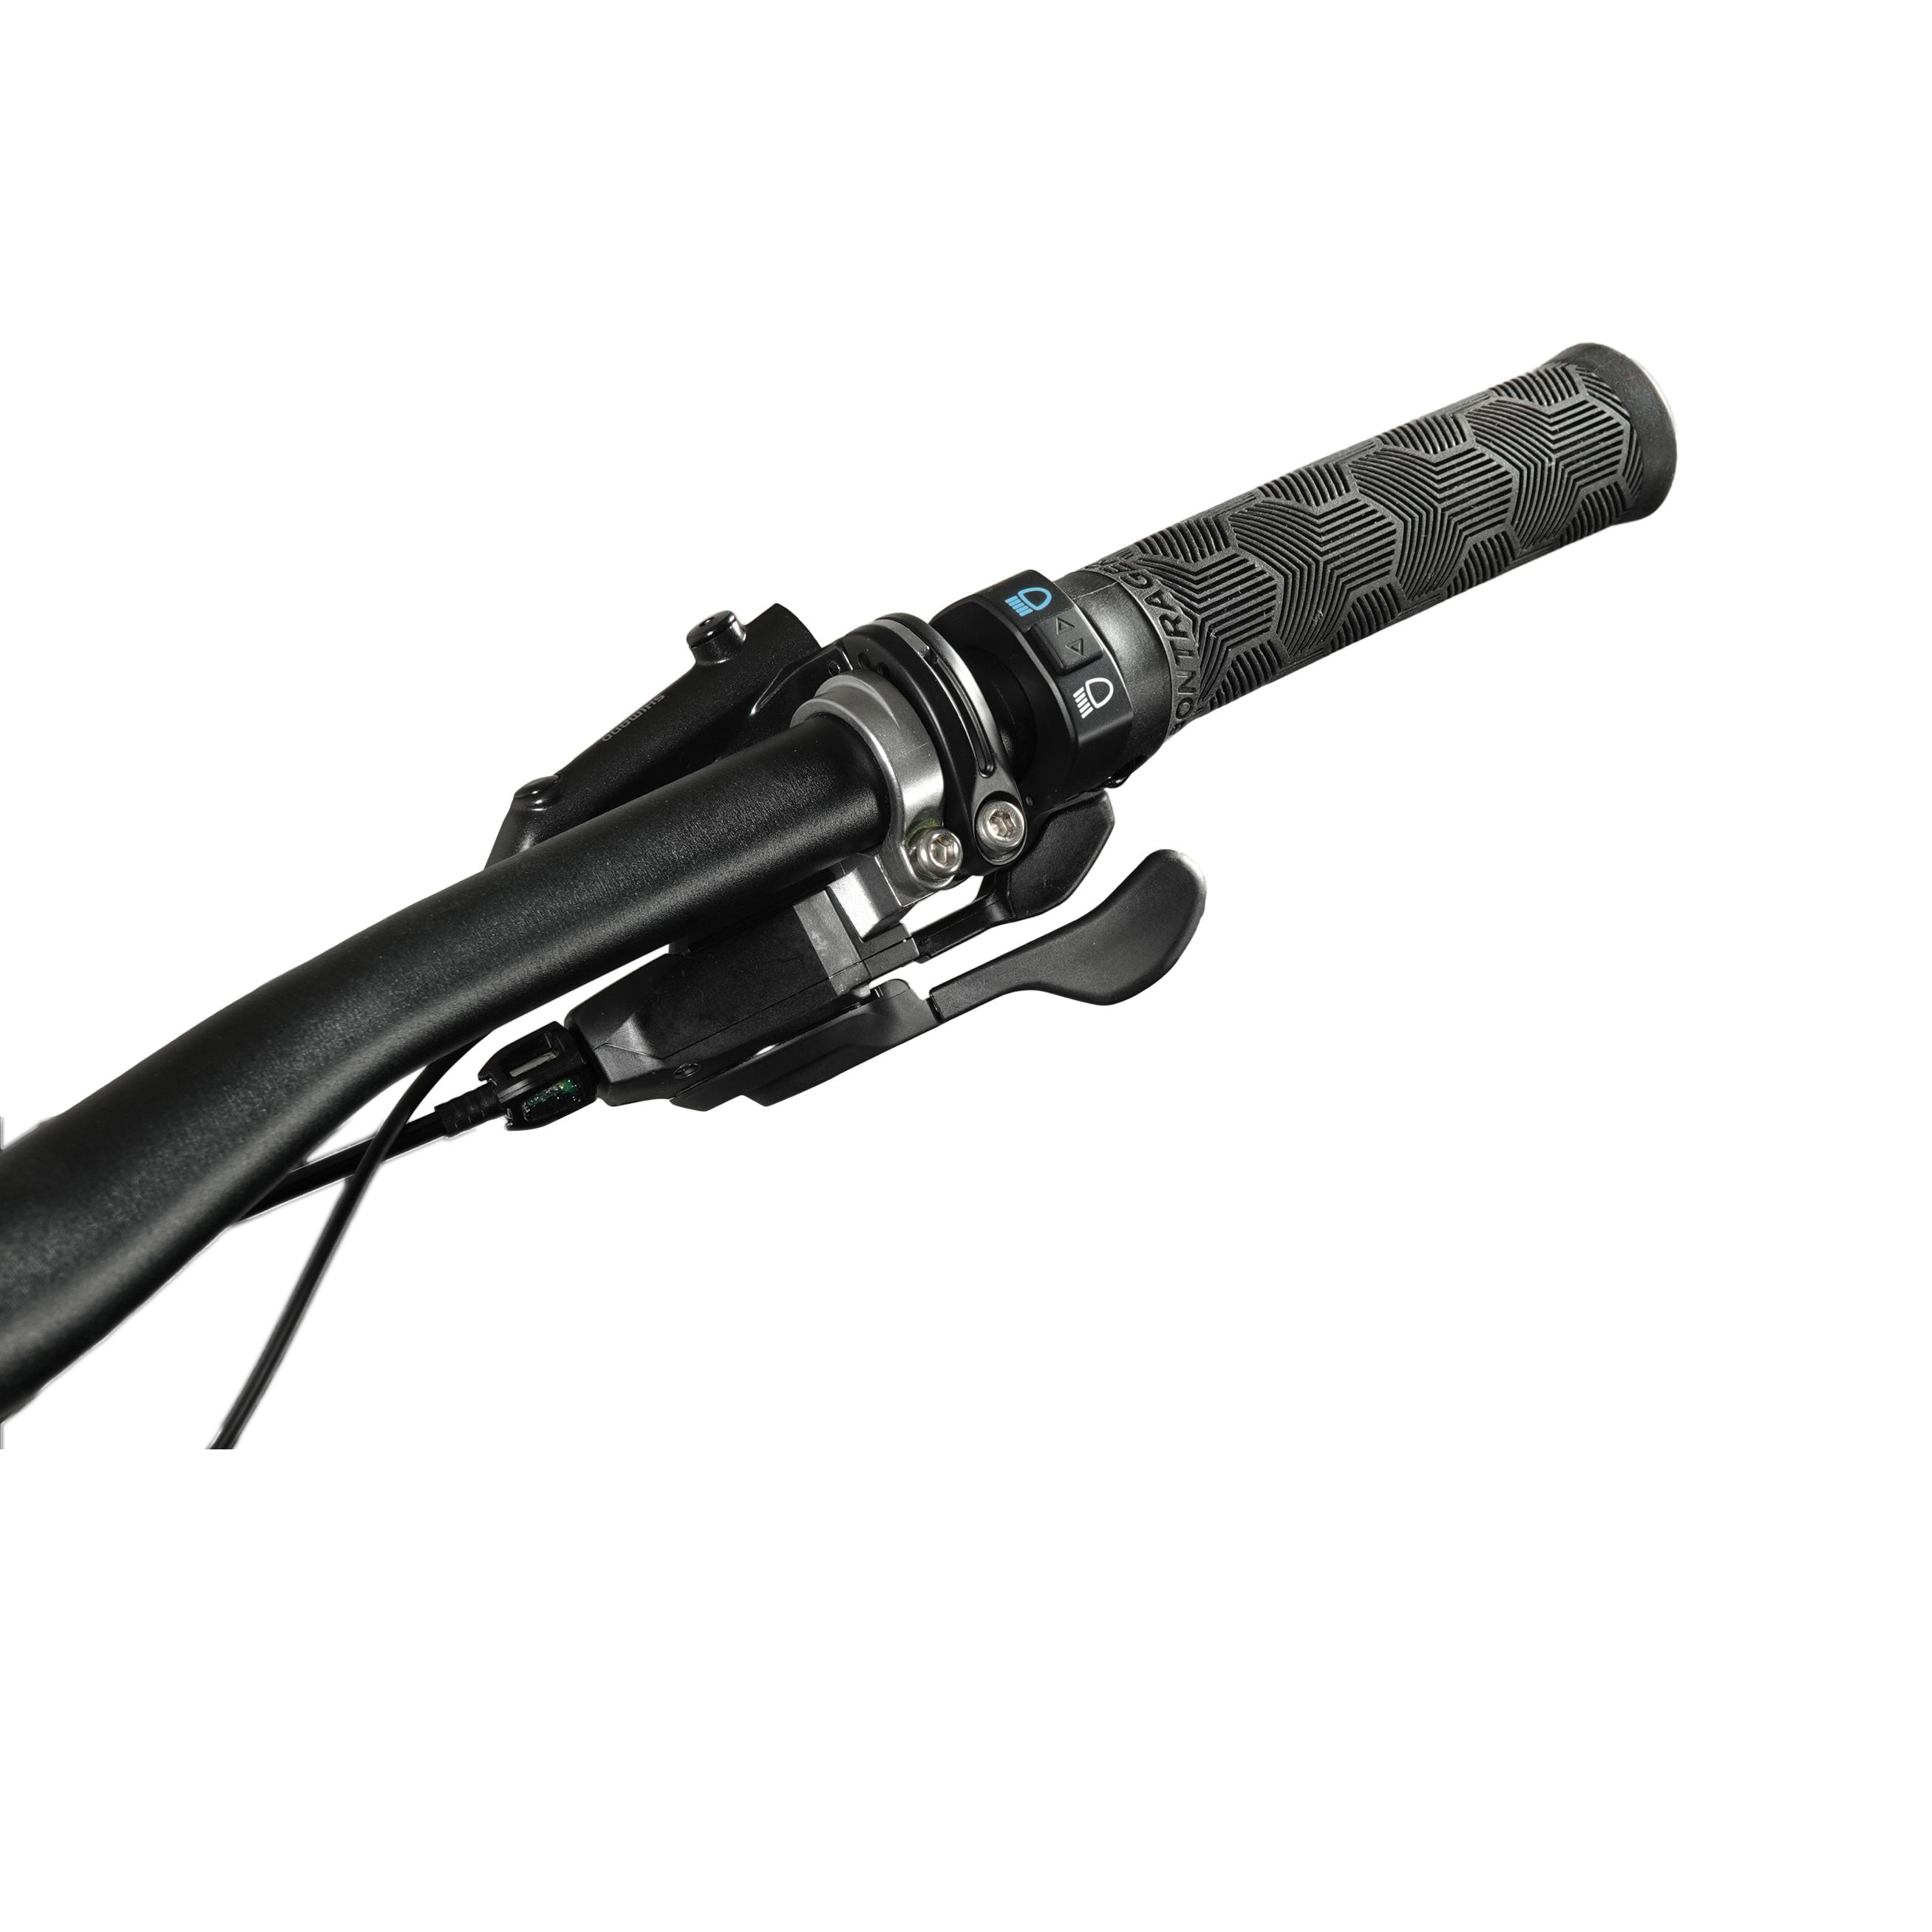 Lupine SL SF Yamaha 31.8mm